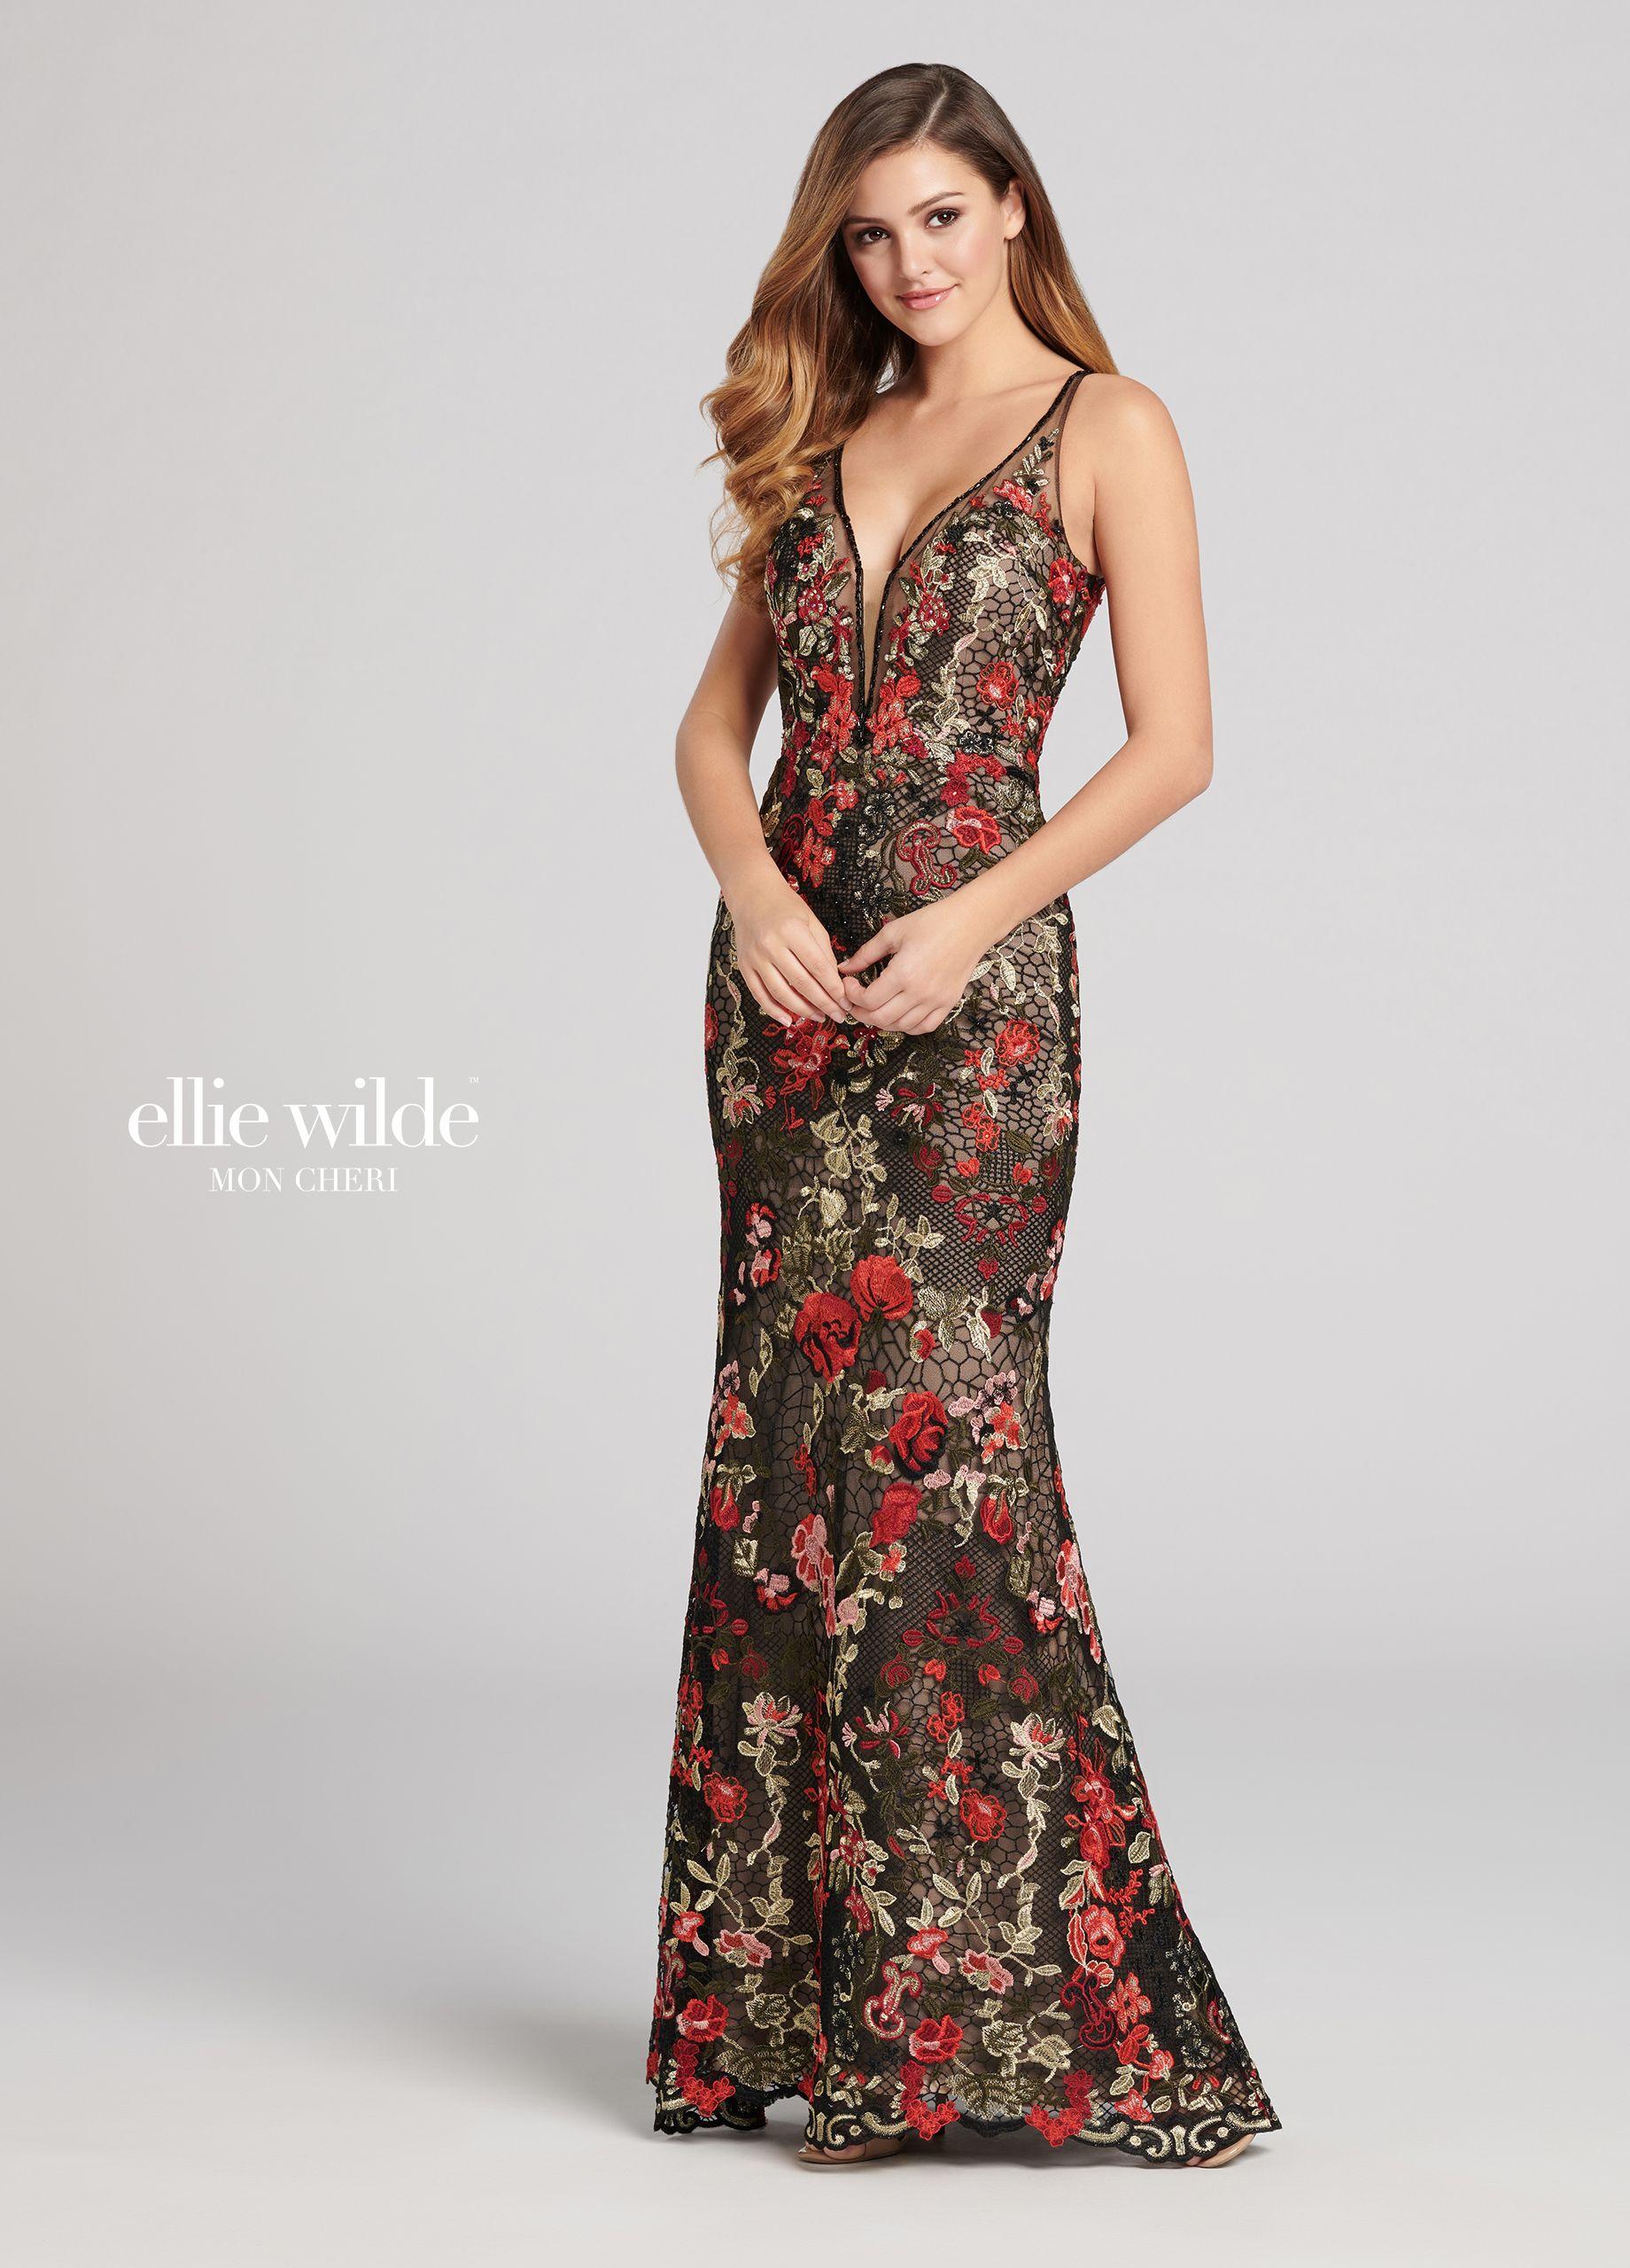 Multicolored lace fit u flare prom dress ew in dinki